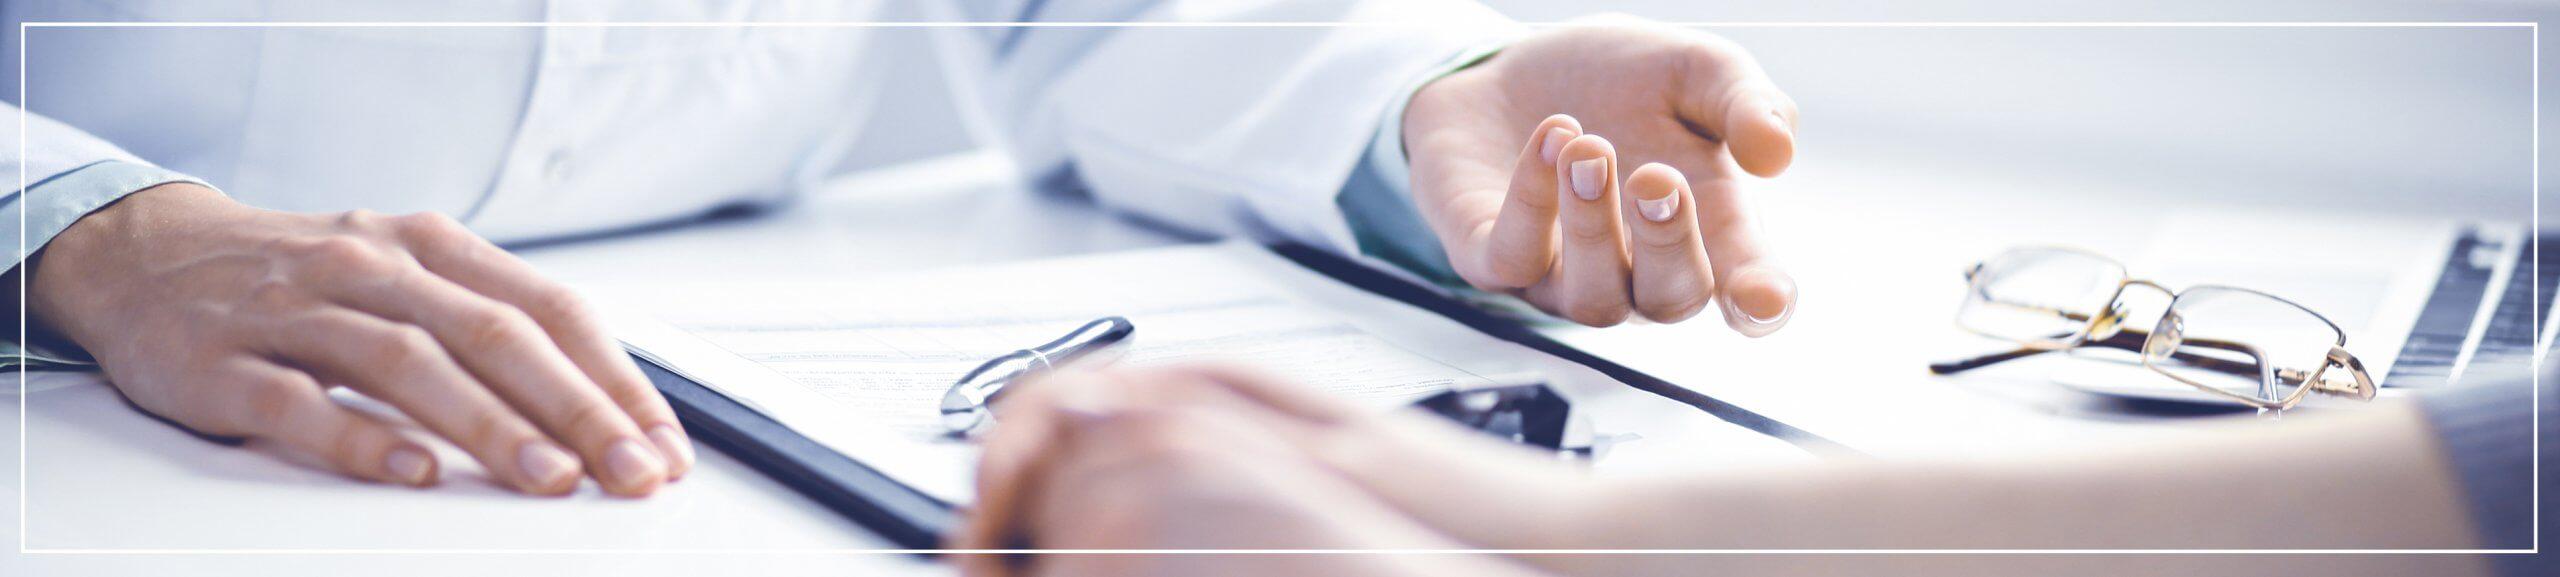 Medical Negligence Team - Case Studies Showcase